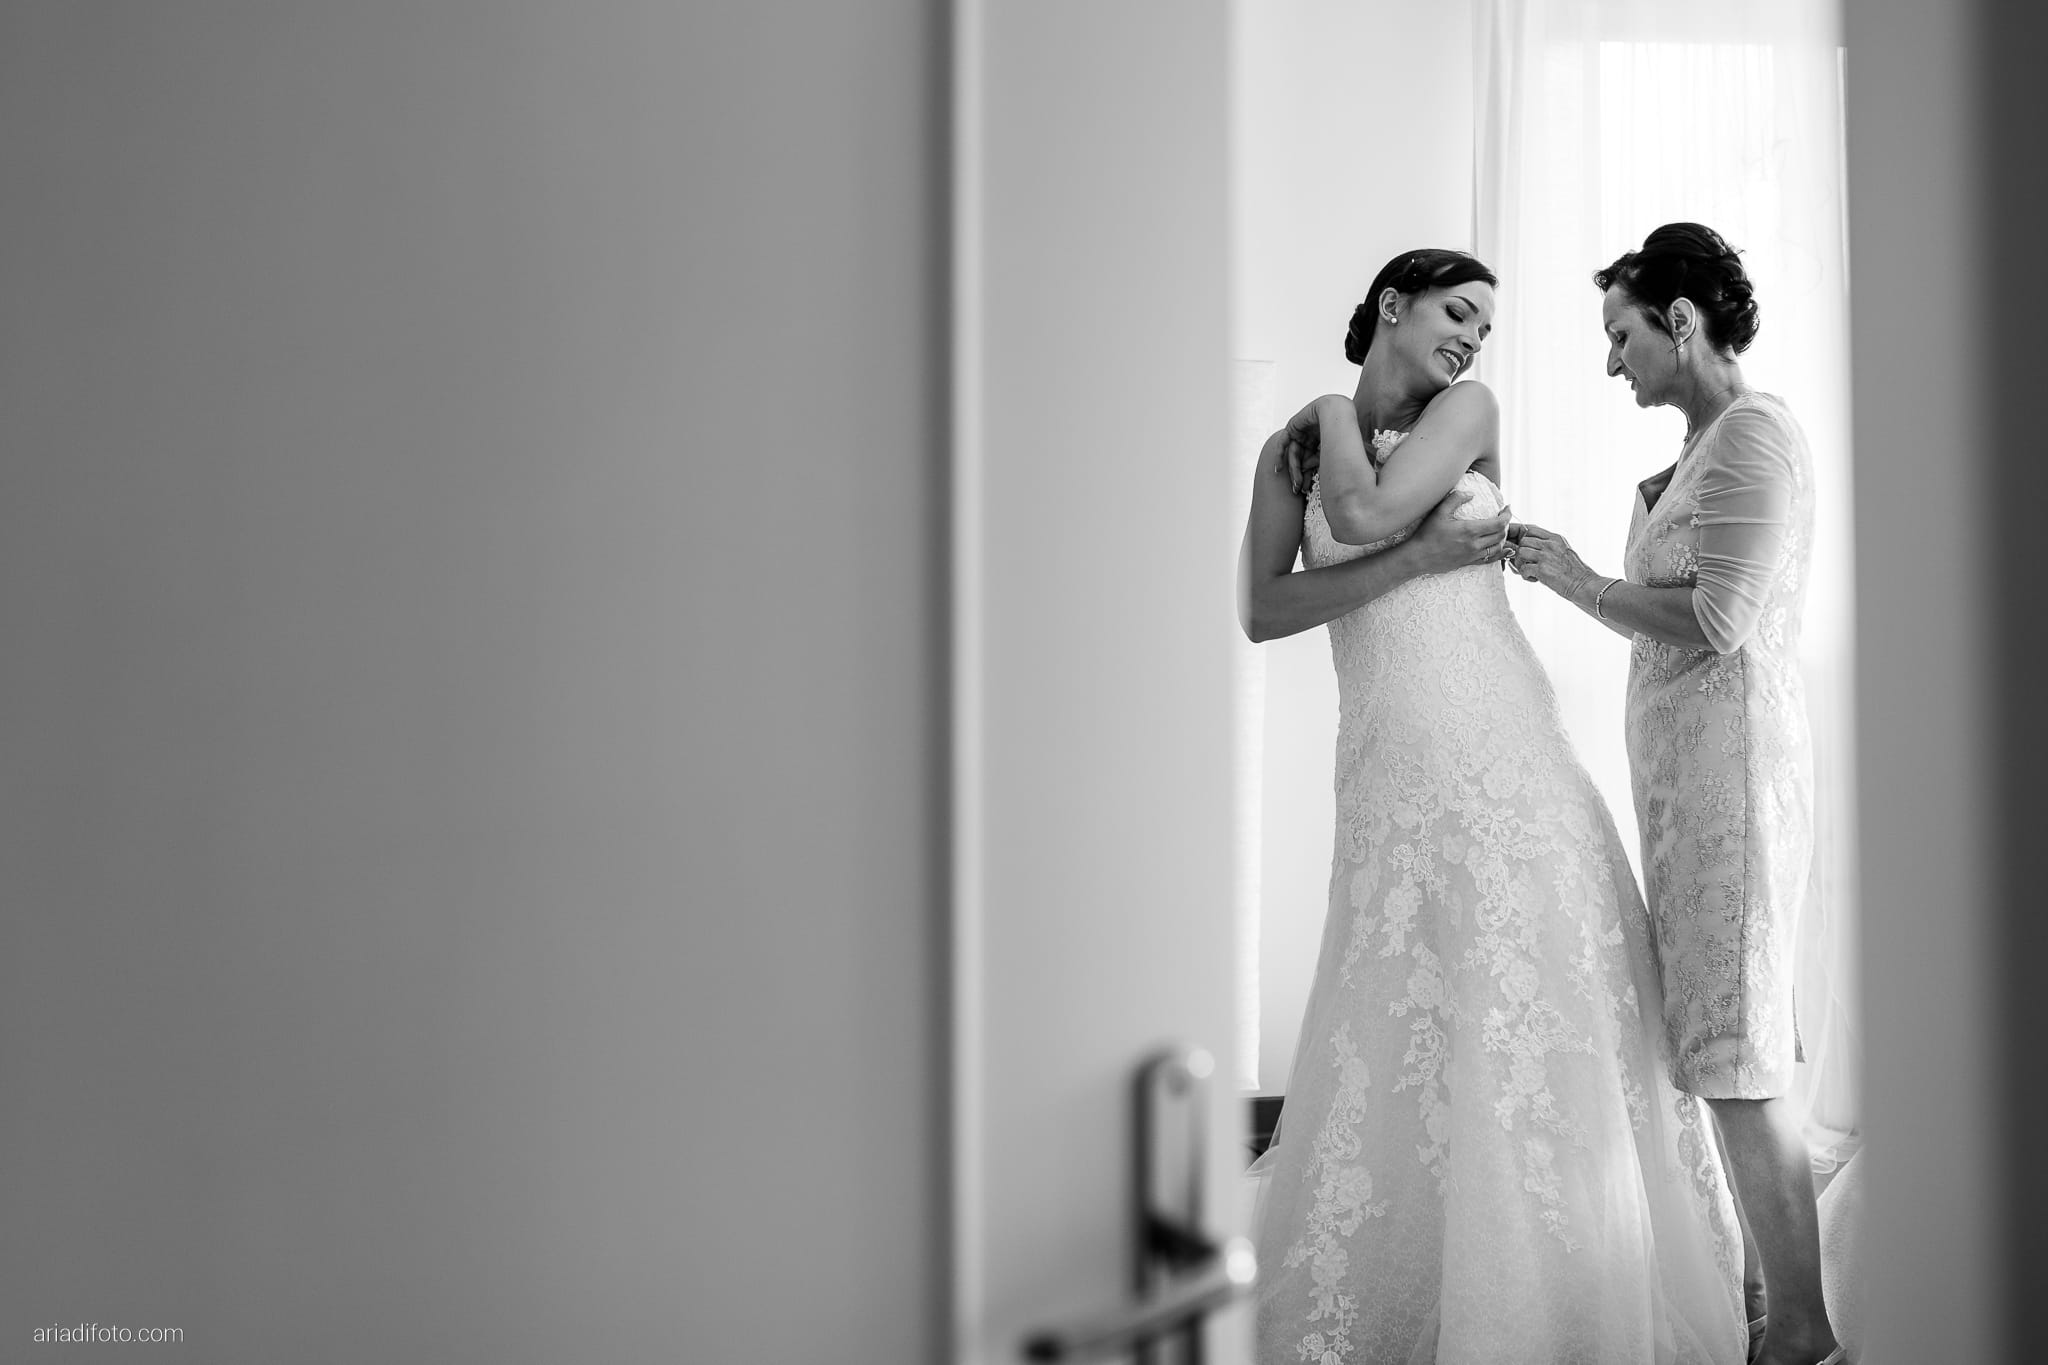 Valentina Marco Matrimonio Duomo Gorizia Castelvecchio Sagrado preparativi sposa